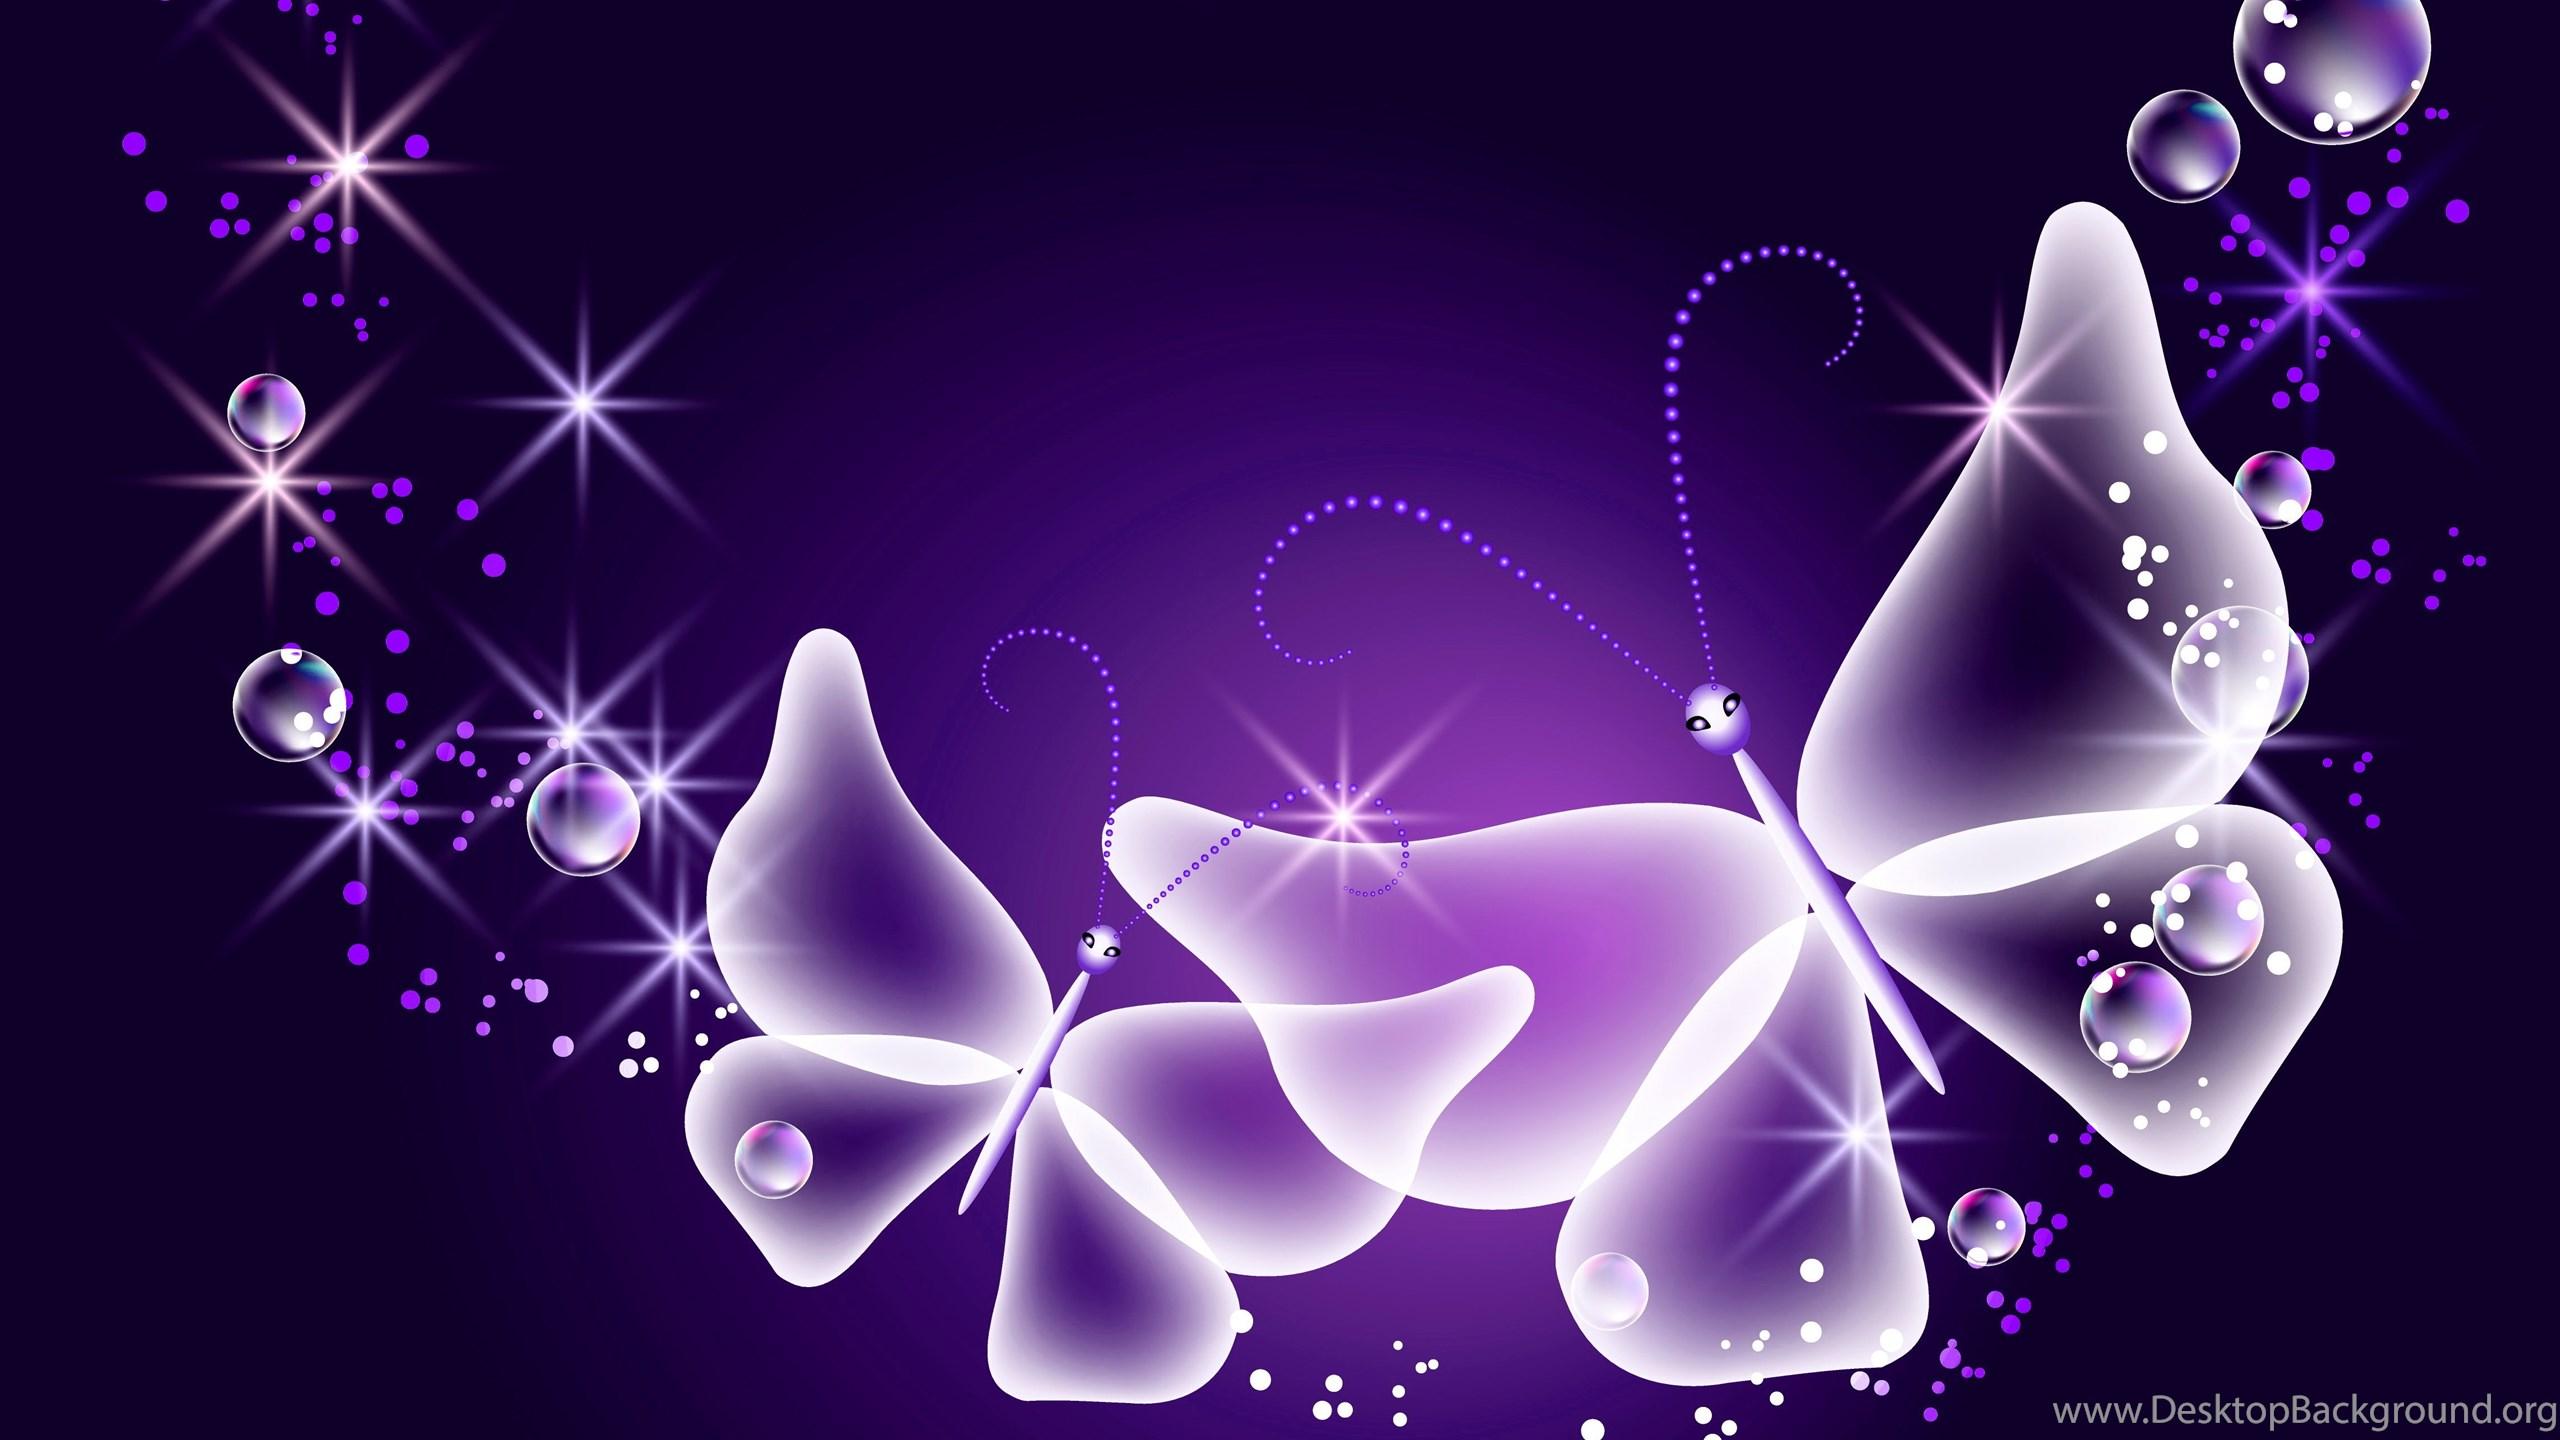 Neon Butterfly Desktop Background: Download Wallpapers Neon, Butterflies, Abstract, Purple